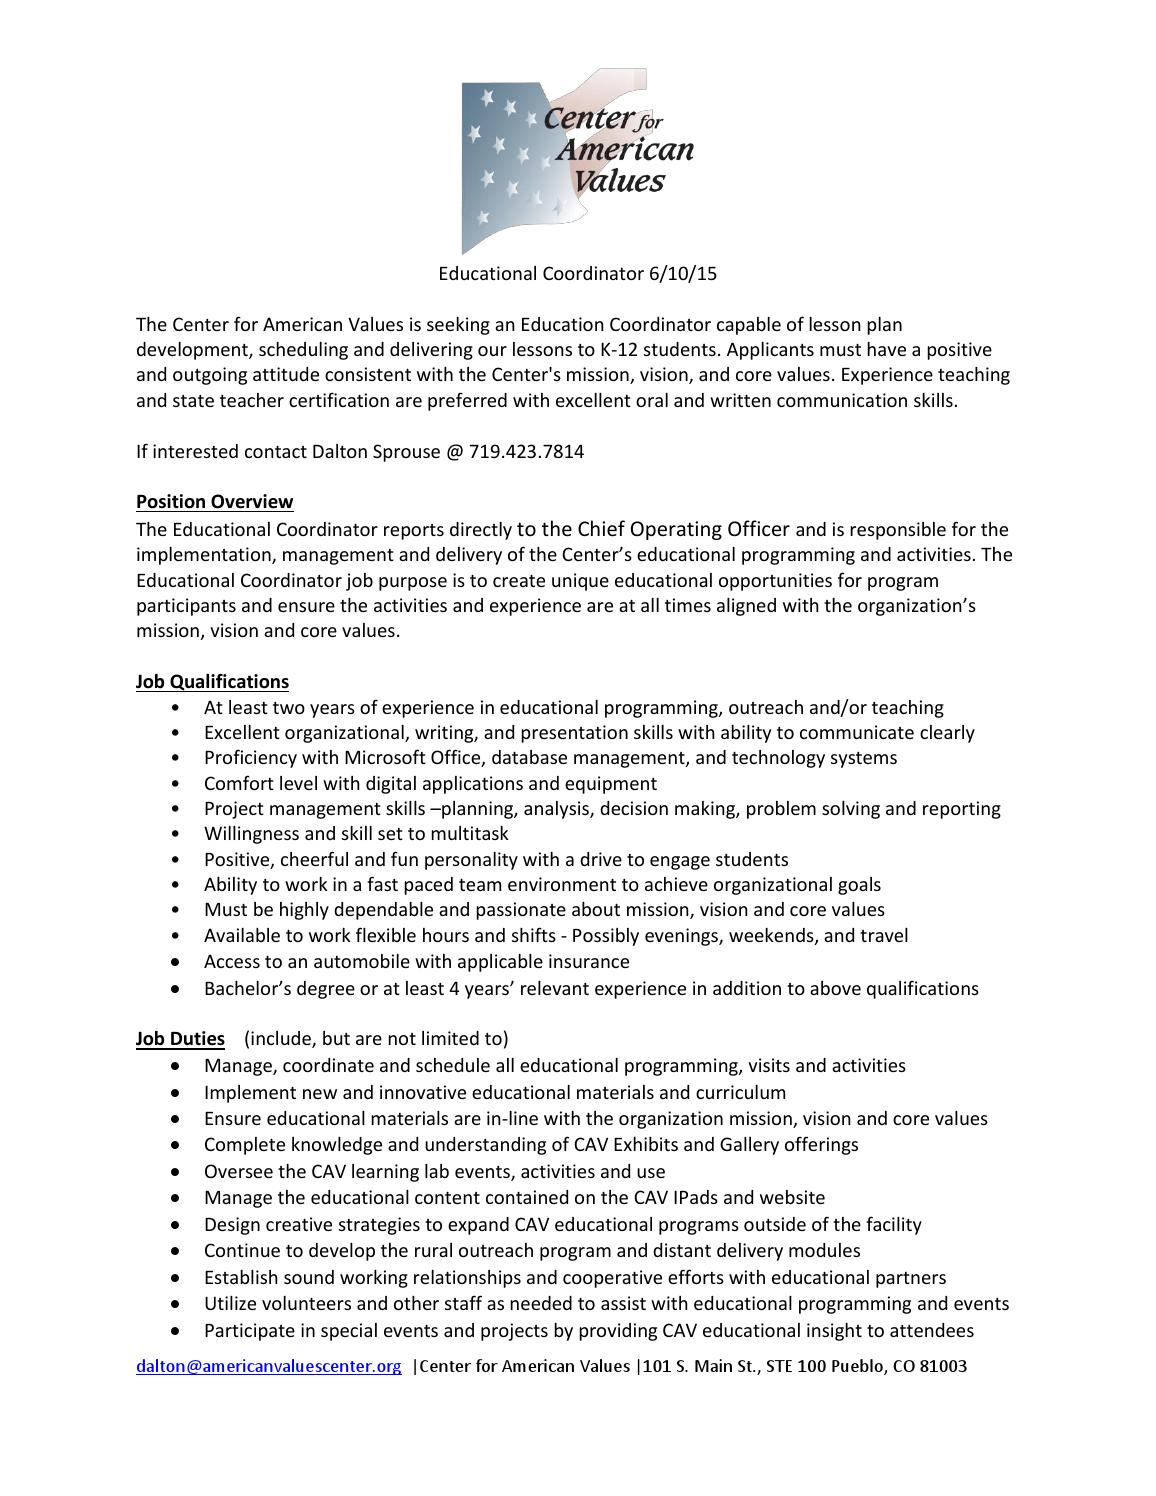 cav educational coordinator position june 2015 by bill mead issuu